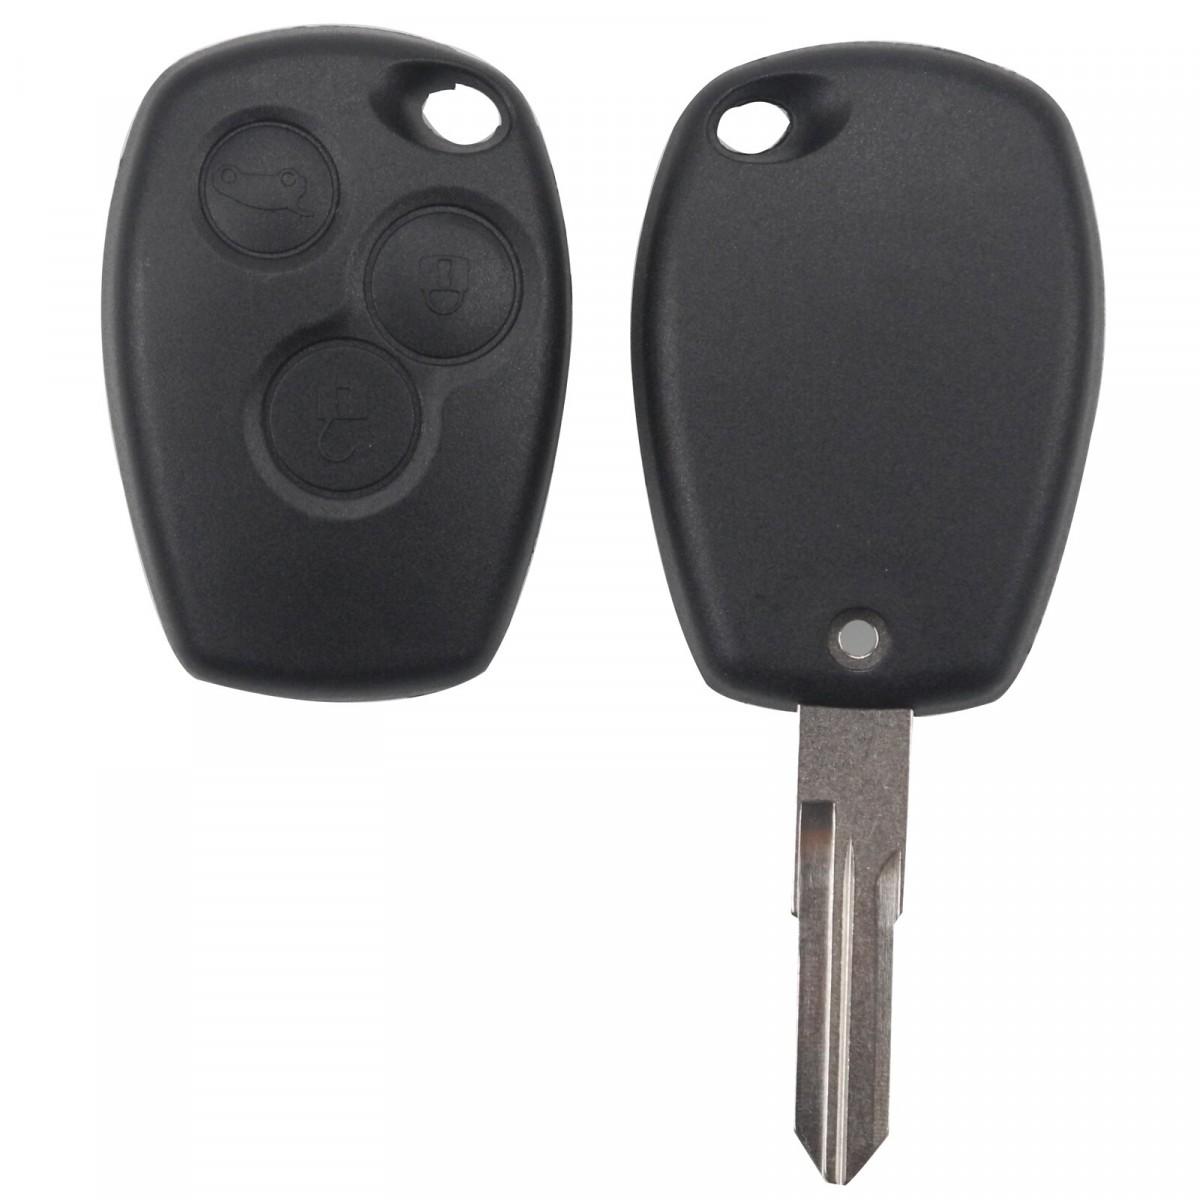 Корпус на Смарт ключ (R0005) Renault (Logan, Sandero, Duster) прямой, 3 кнопки